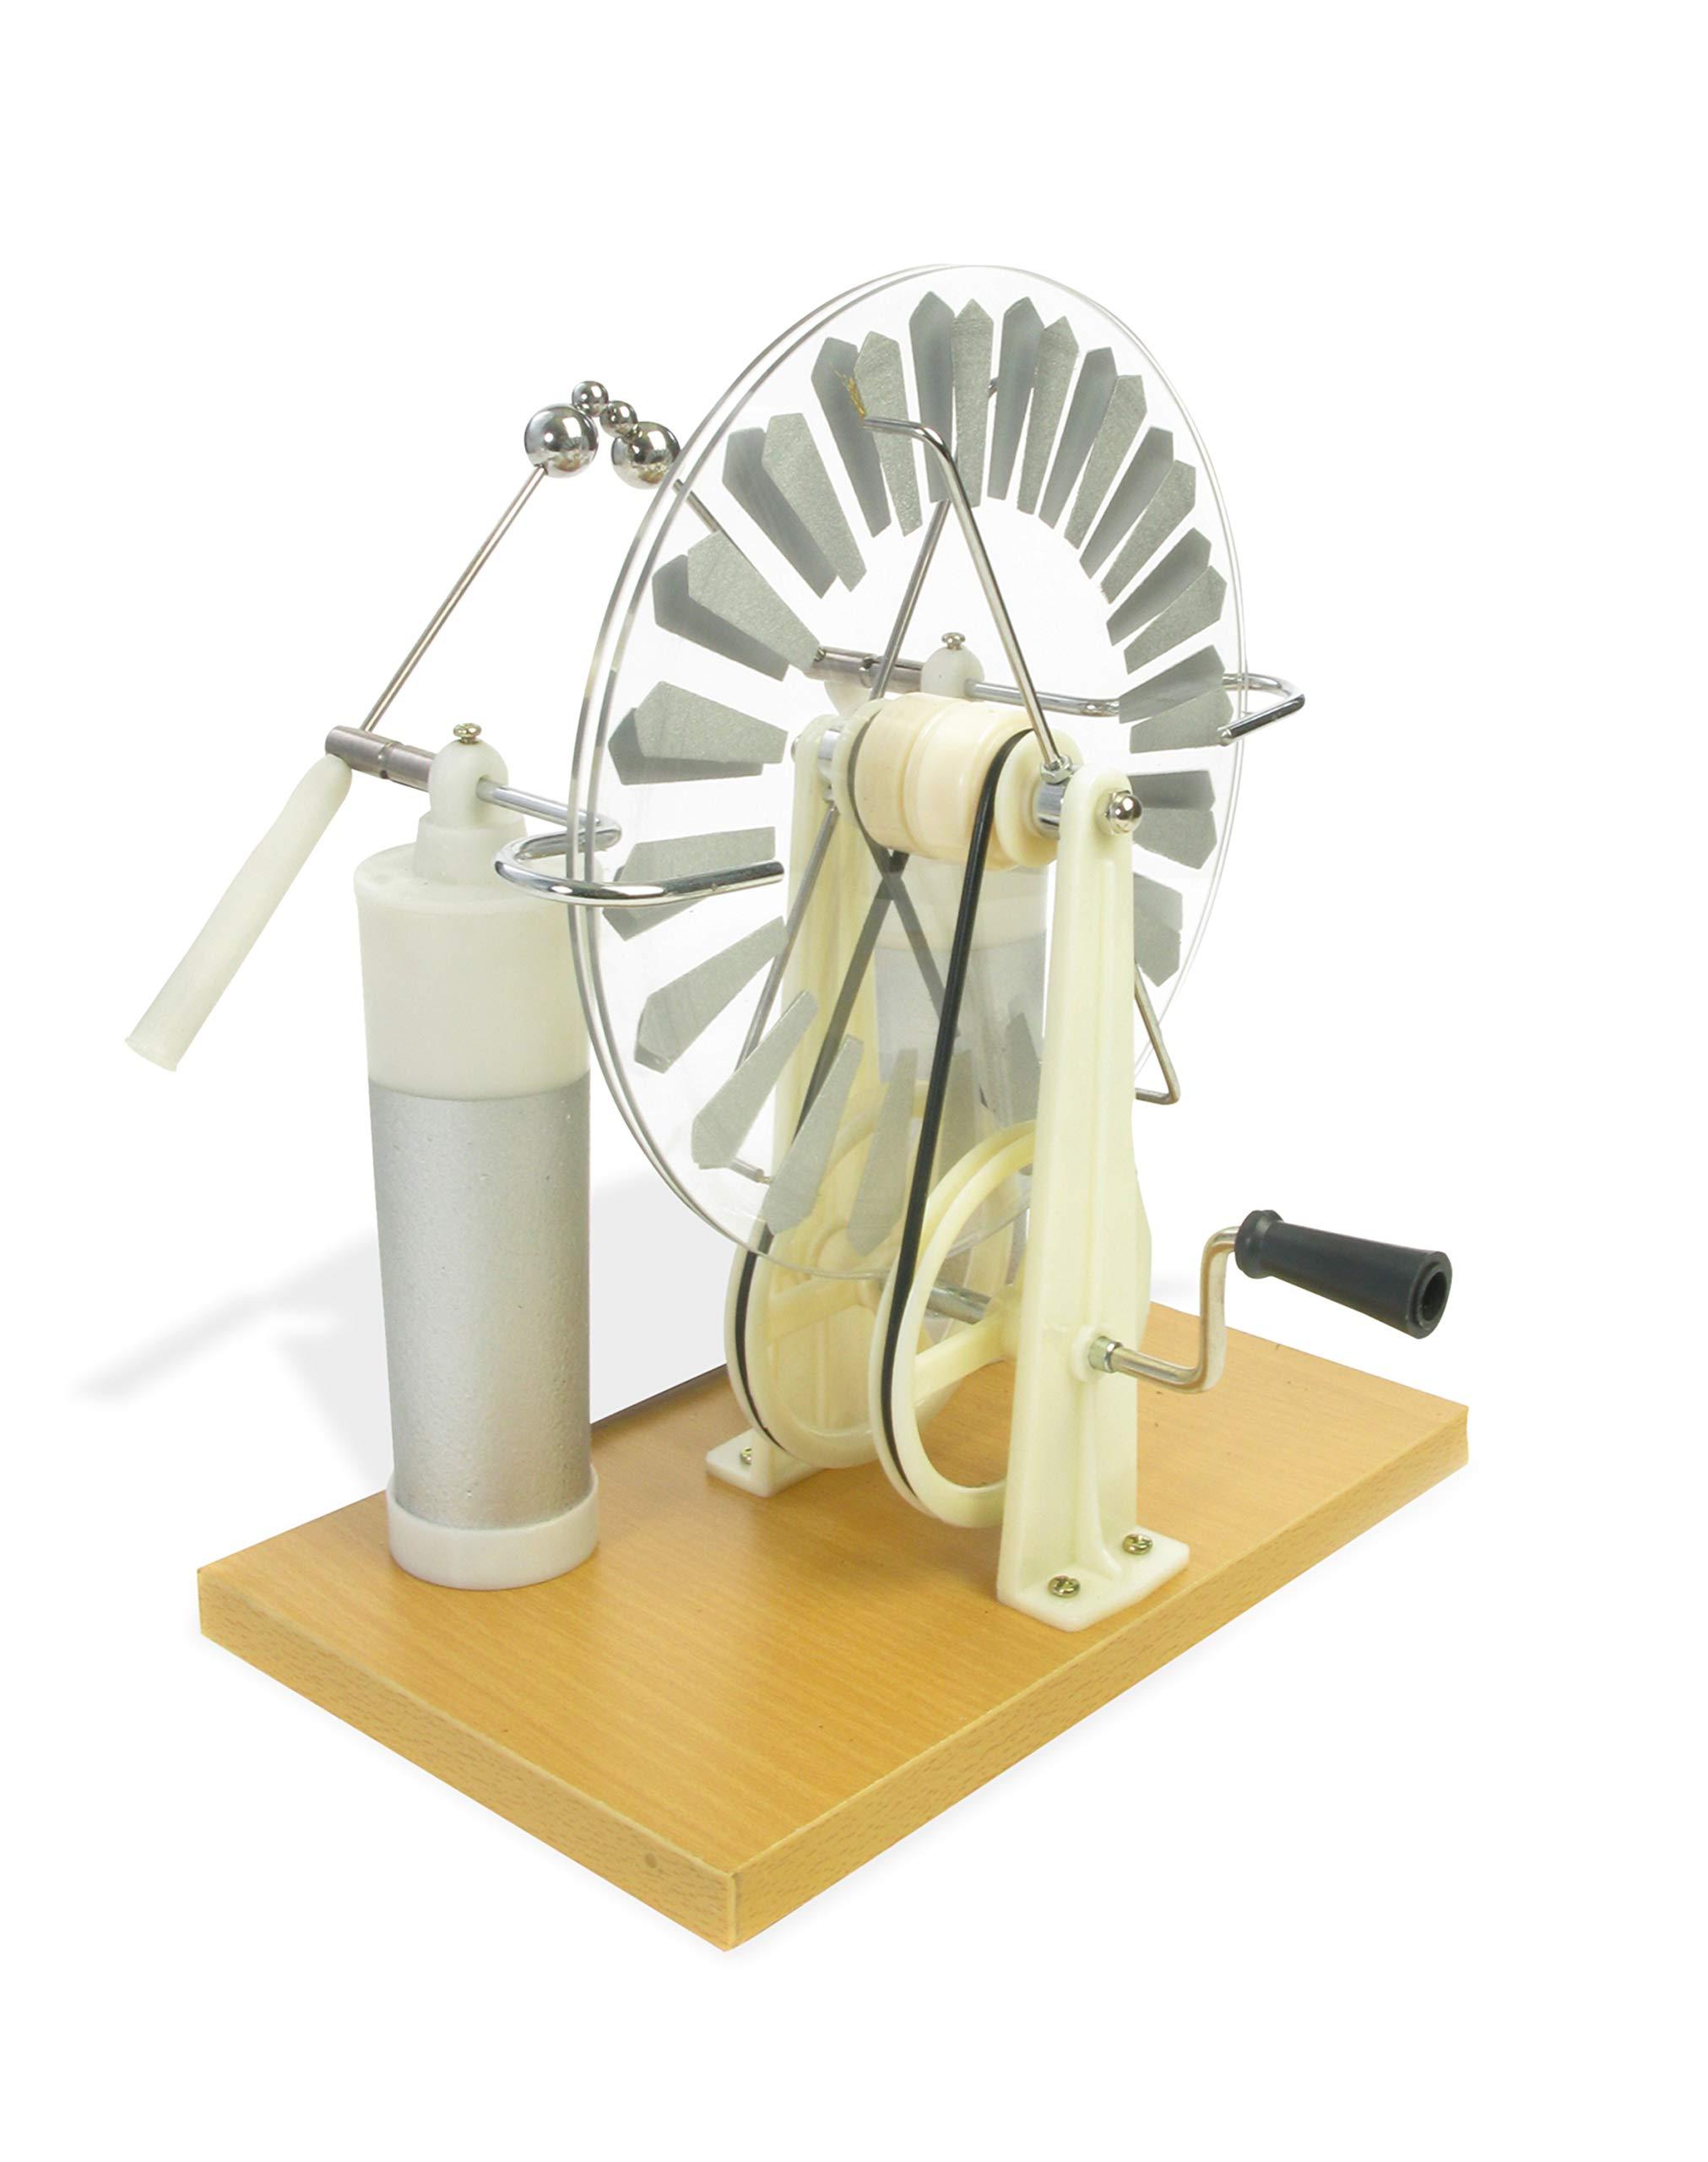 American Educational 7-509 Plastic Economy Wimshurst Machine